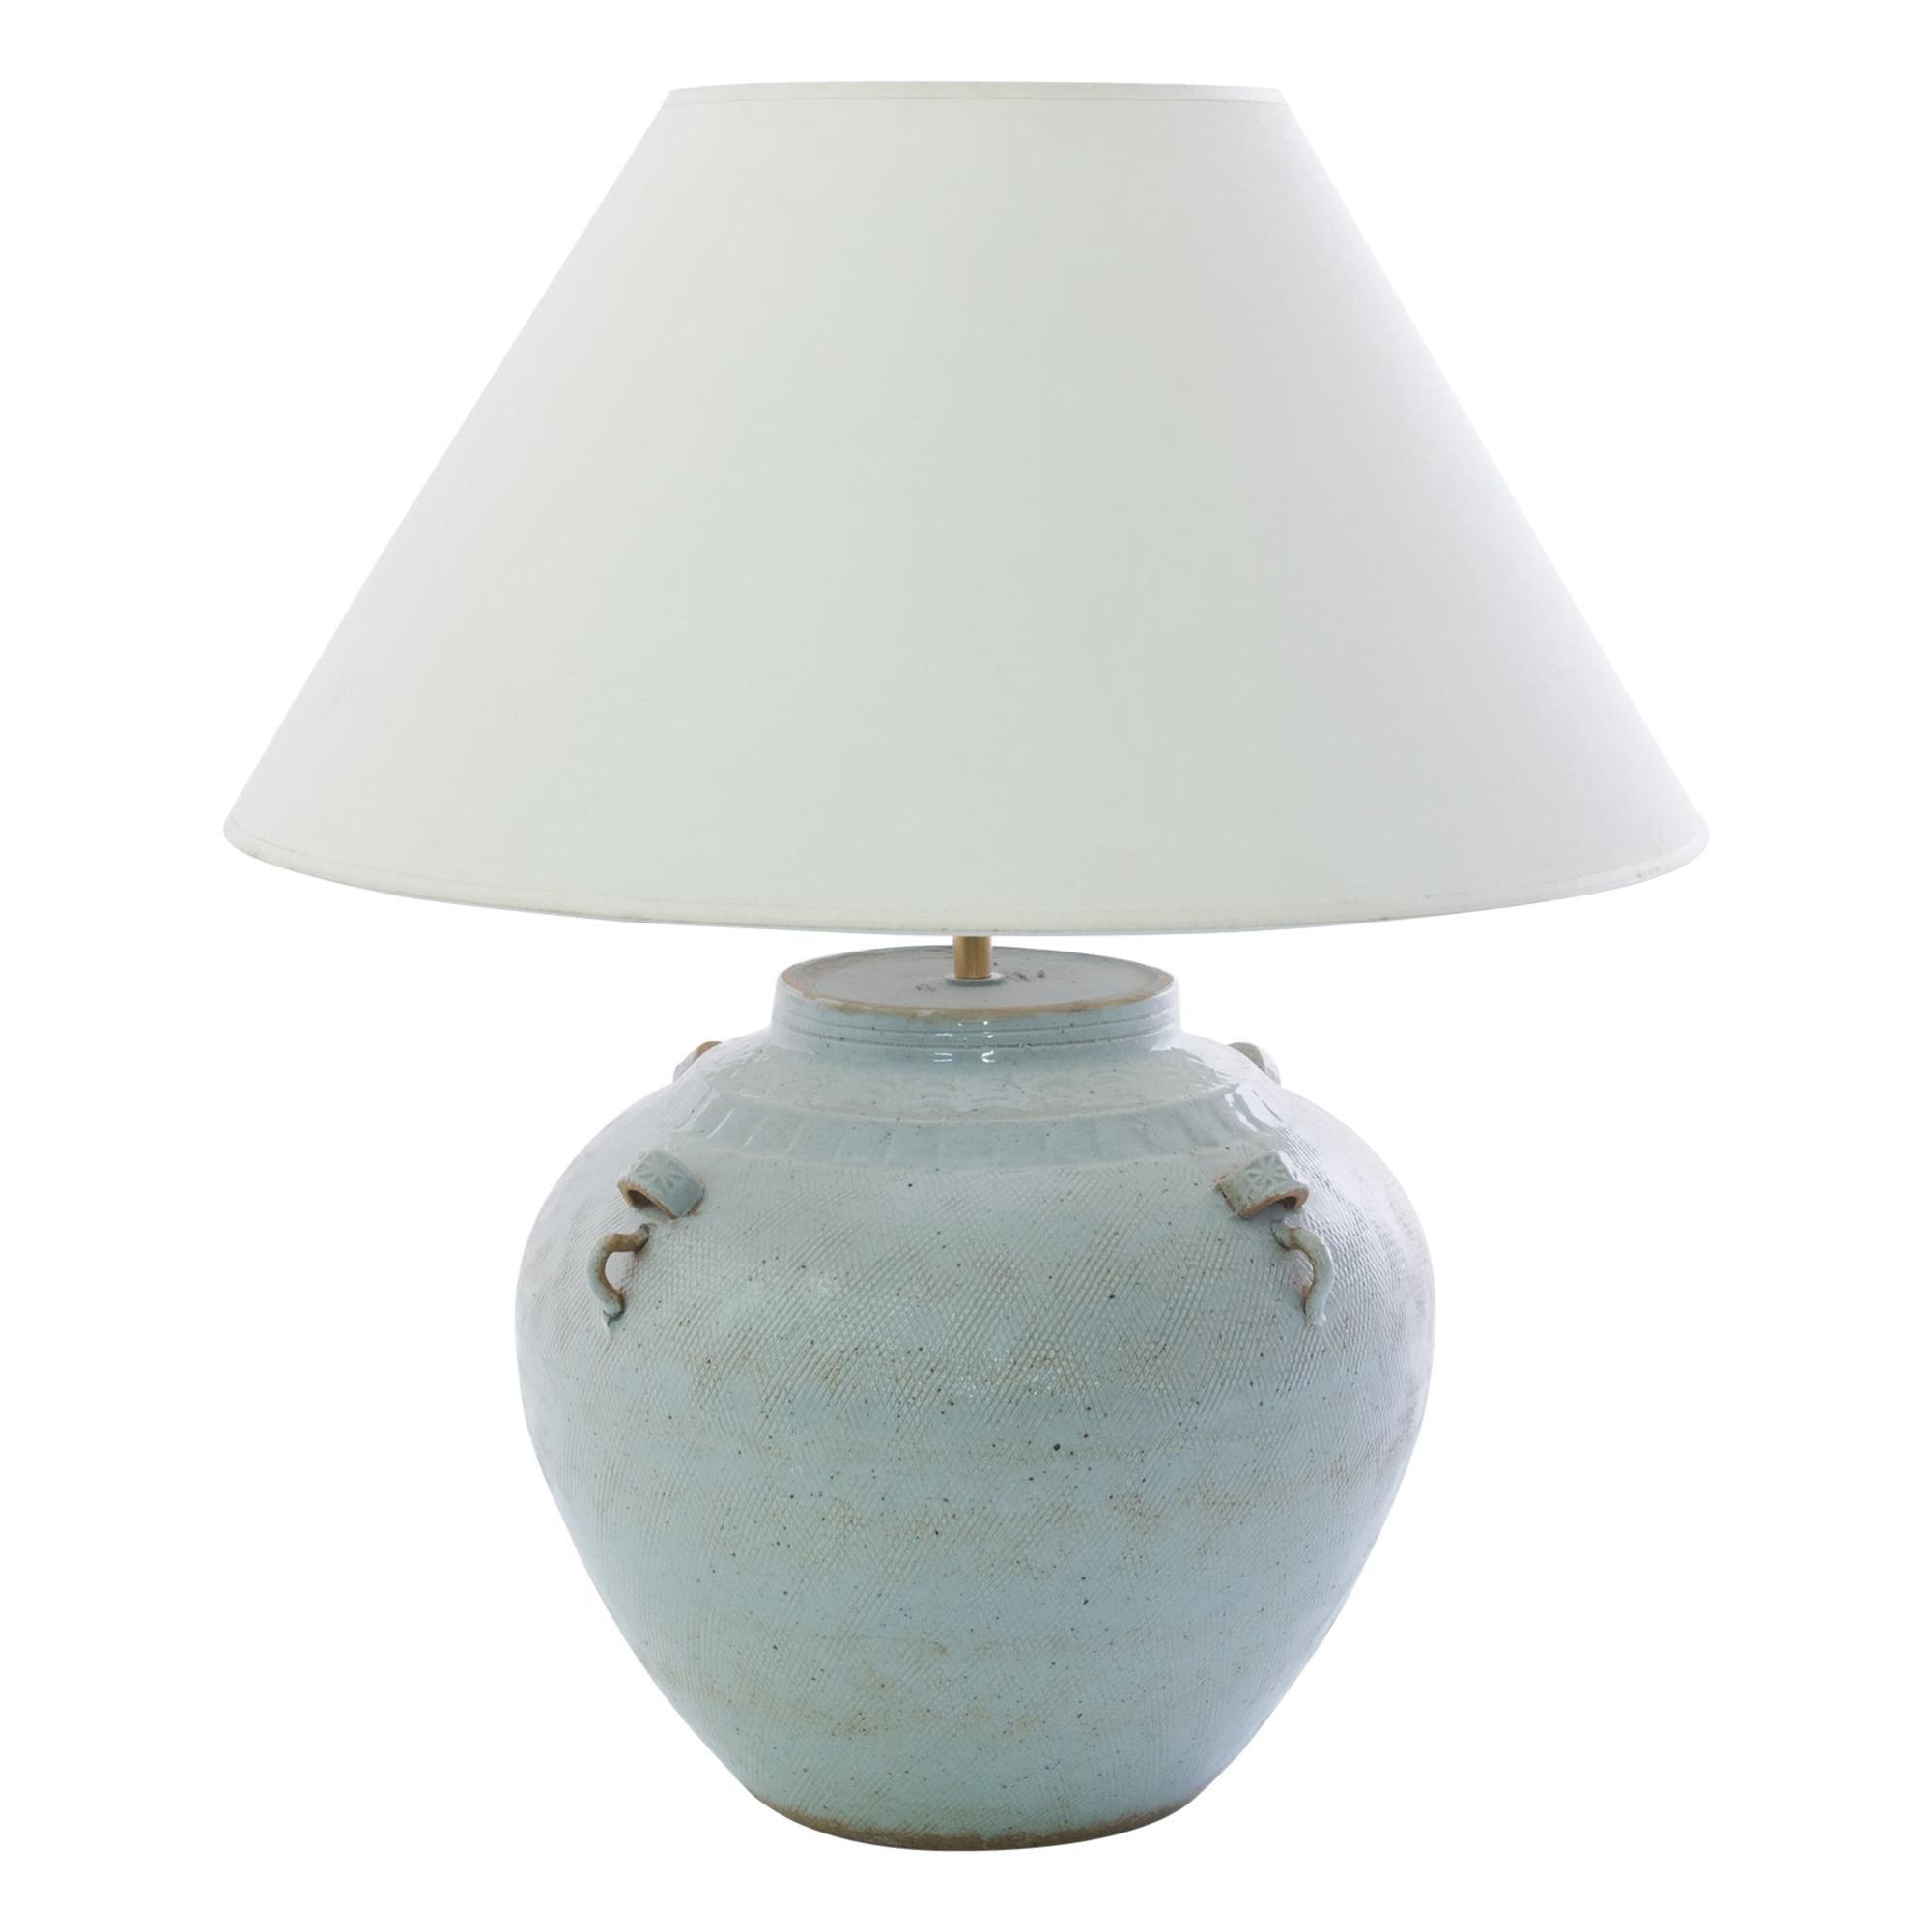 Antique Chinese Textured Light Blue Ceramic Vase Table Lamp